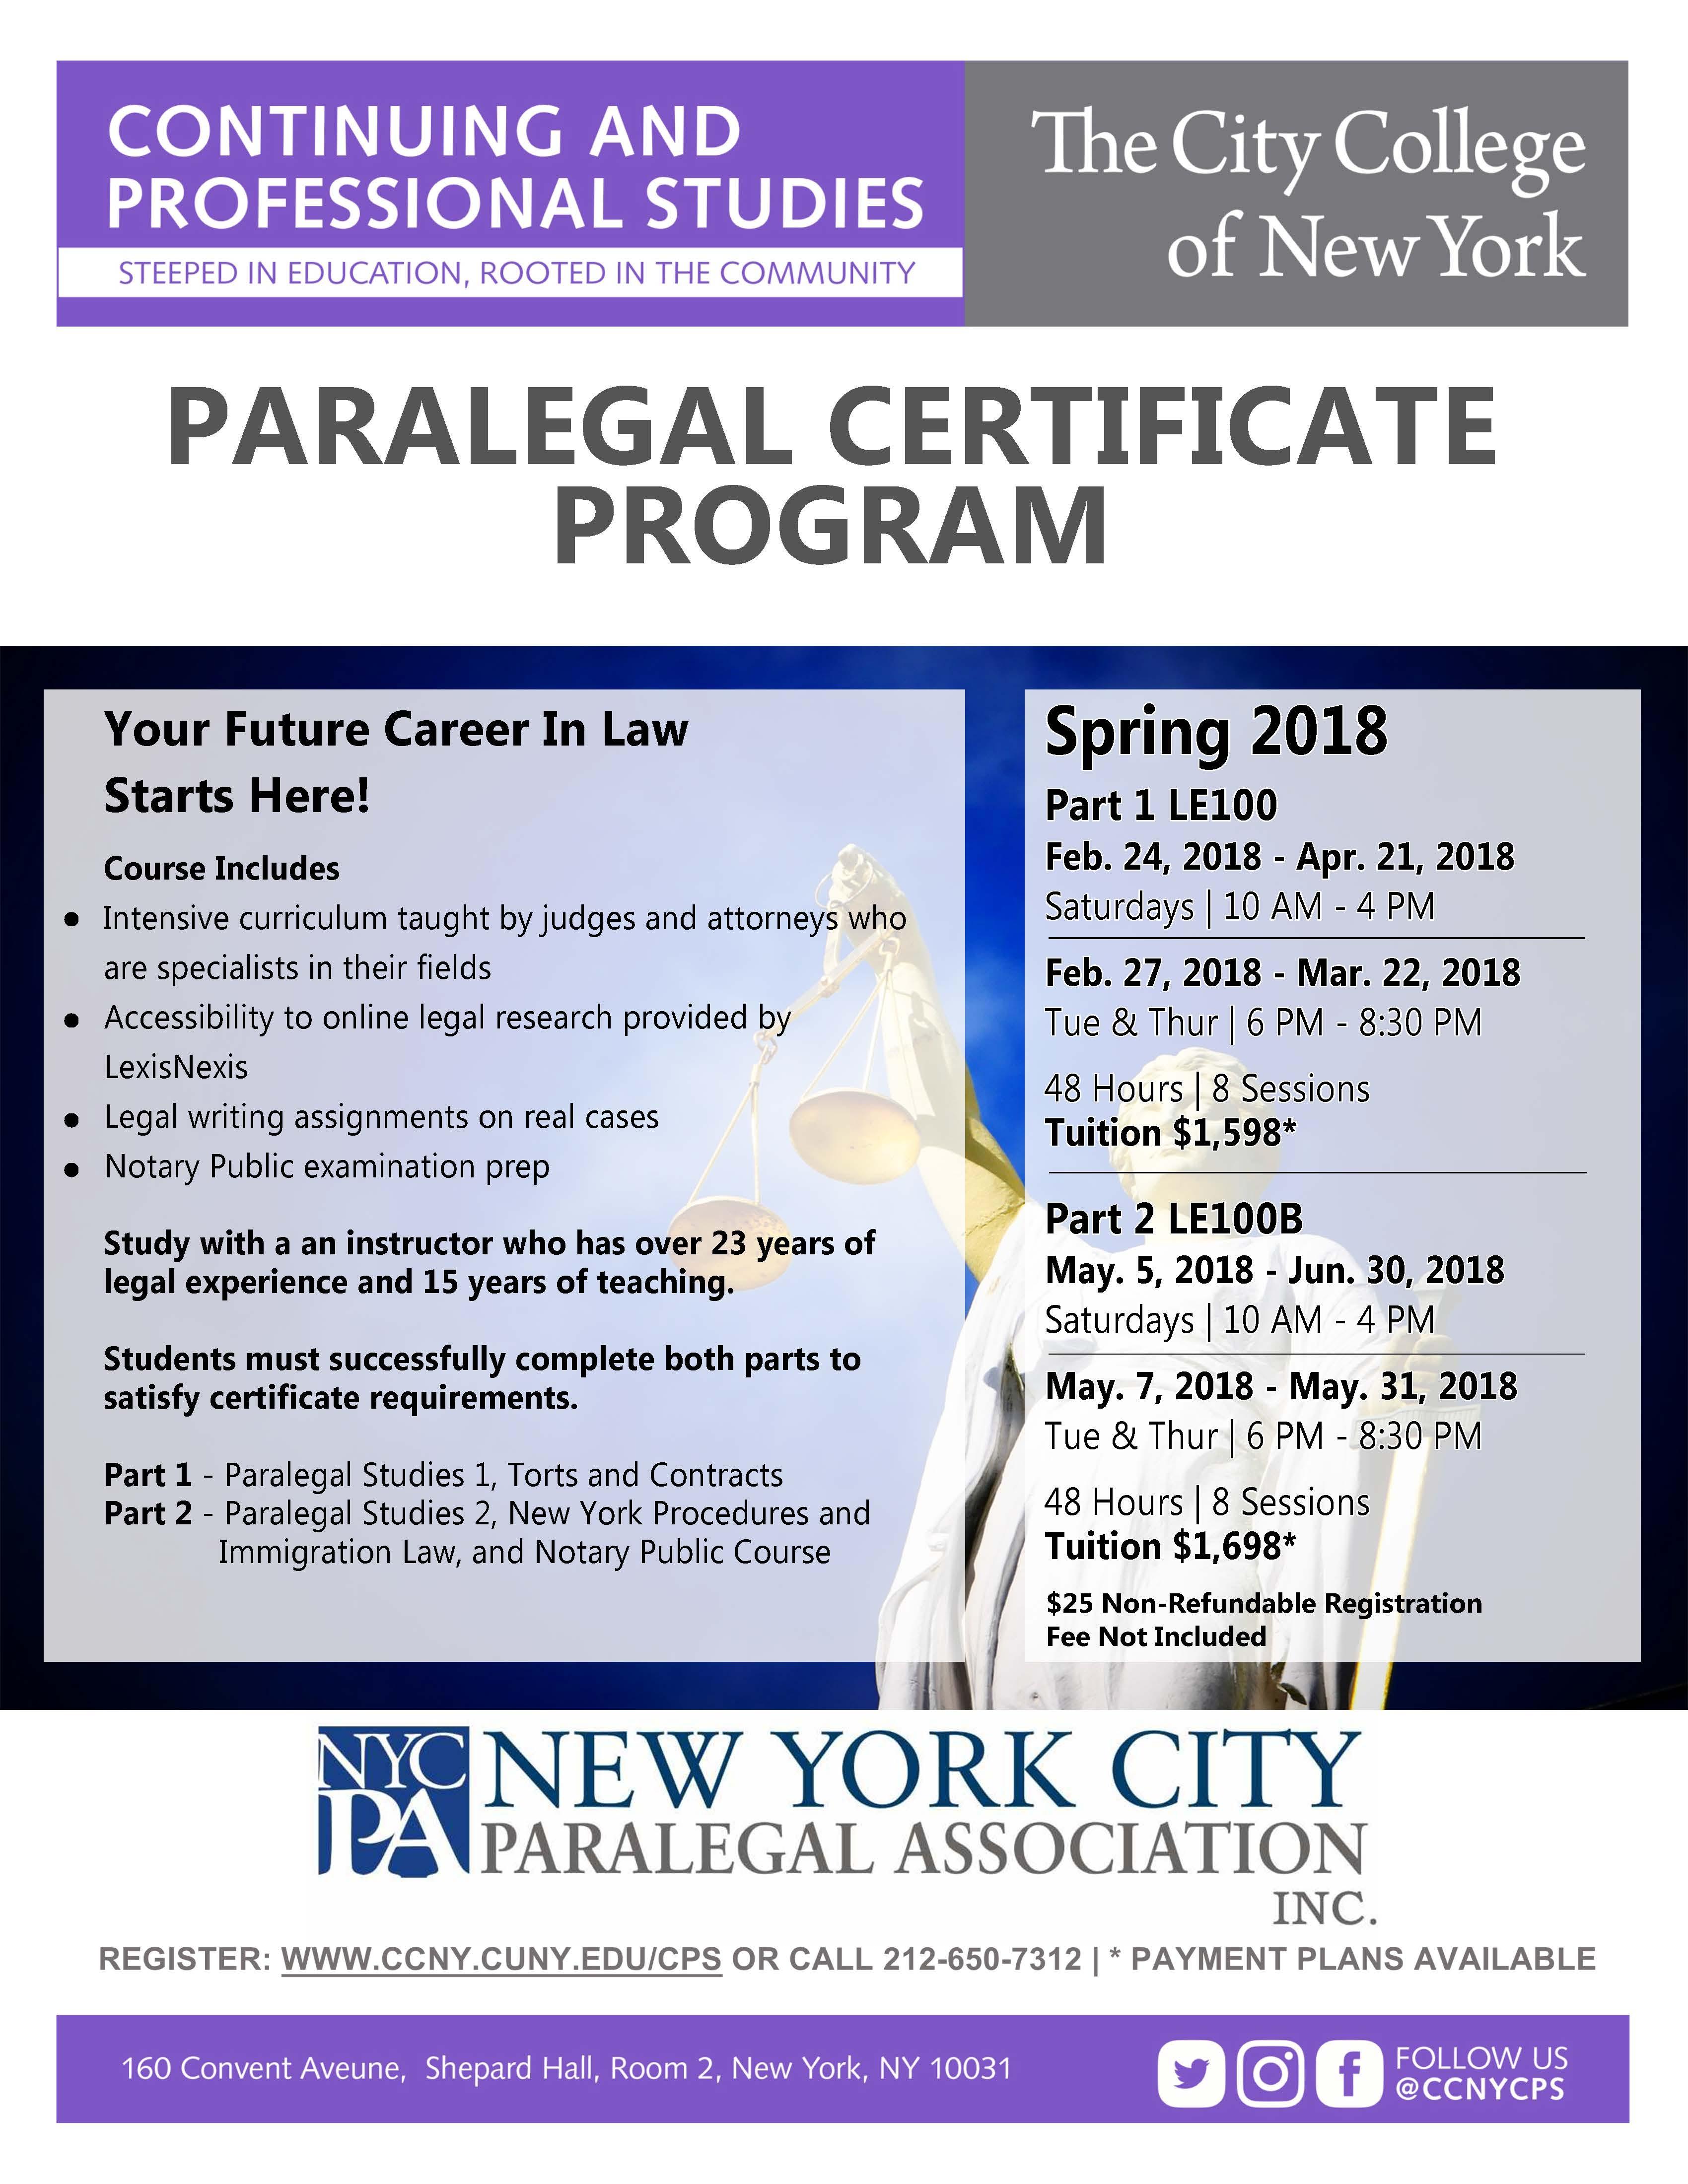 Paralegal studies certificate program the city college of new york paralegal studies certificate program student 2016 xflitez Choice Image